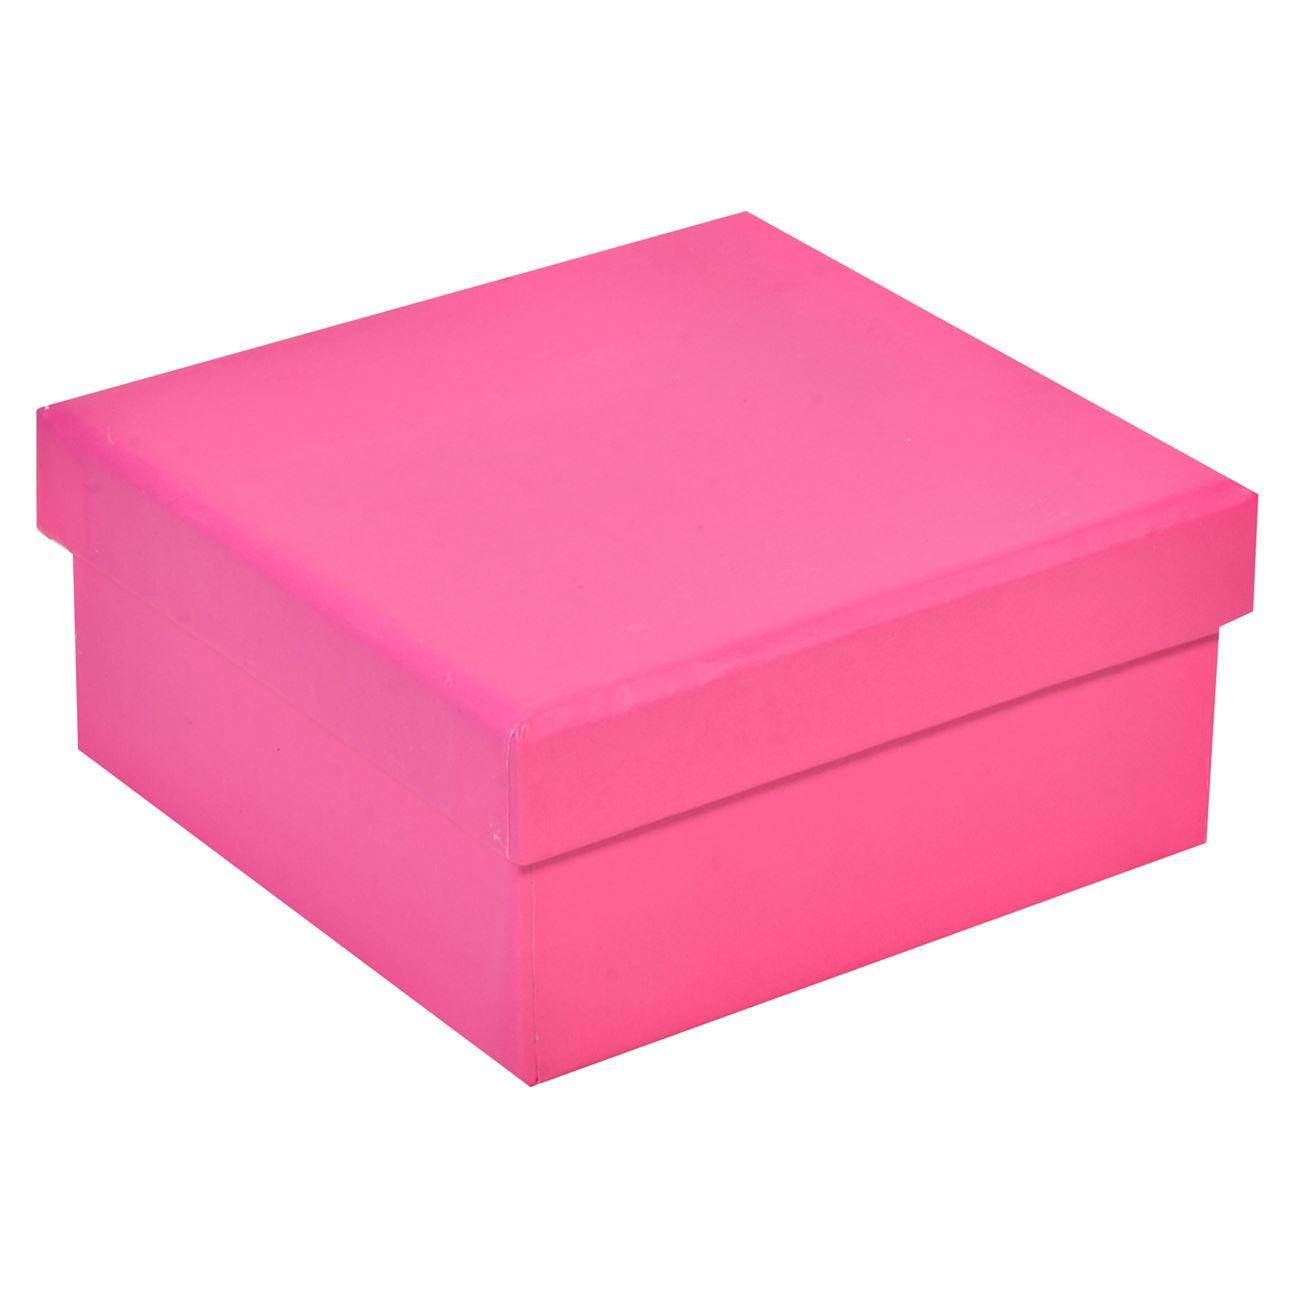 fb0e5e210dba Κουτί Συσκευασίας Χάρτινο Φούξια 8x8x4.5   Κουτιά Χάρτινα Μίνι